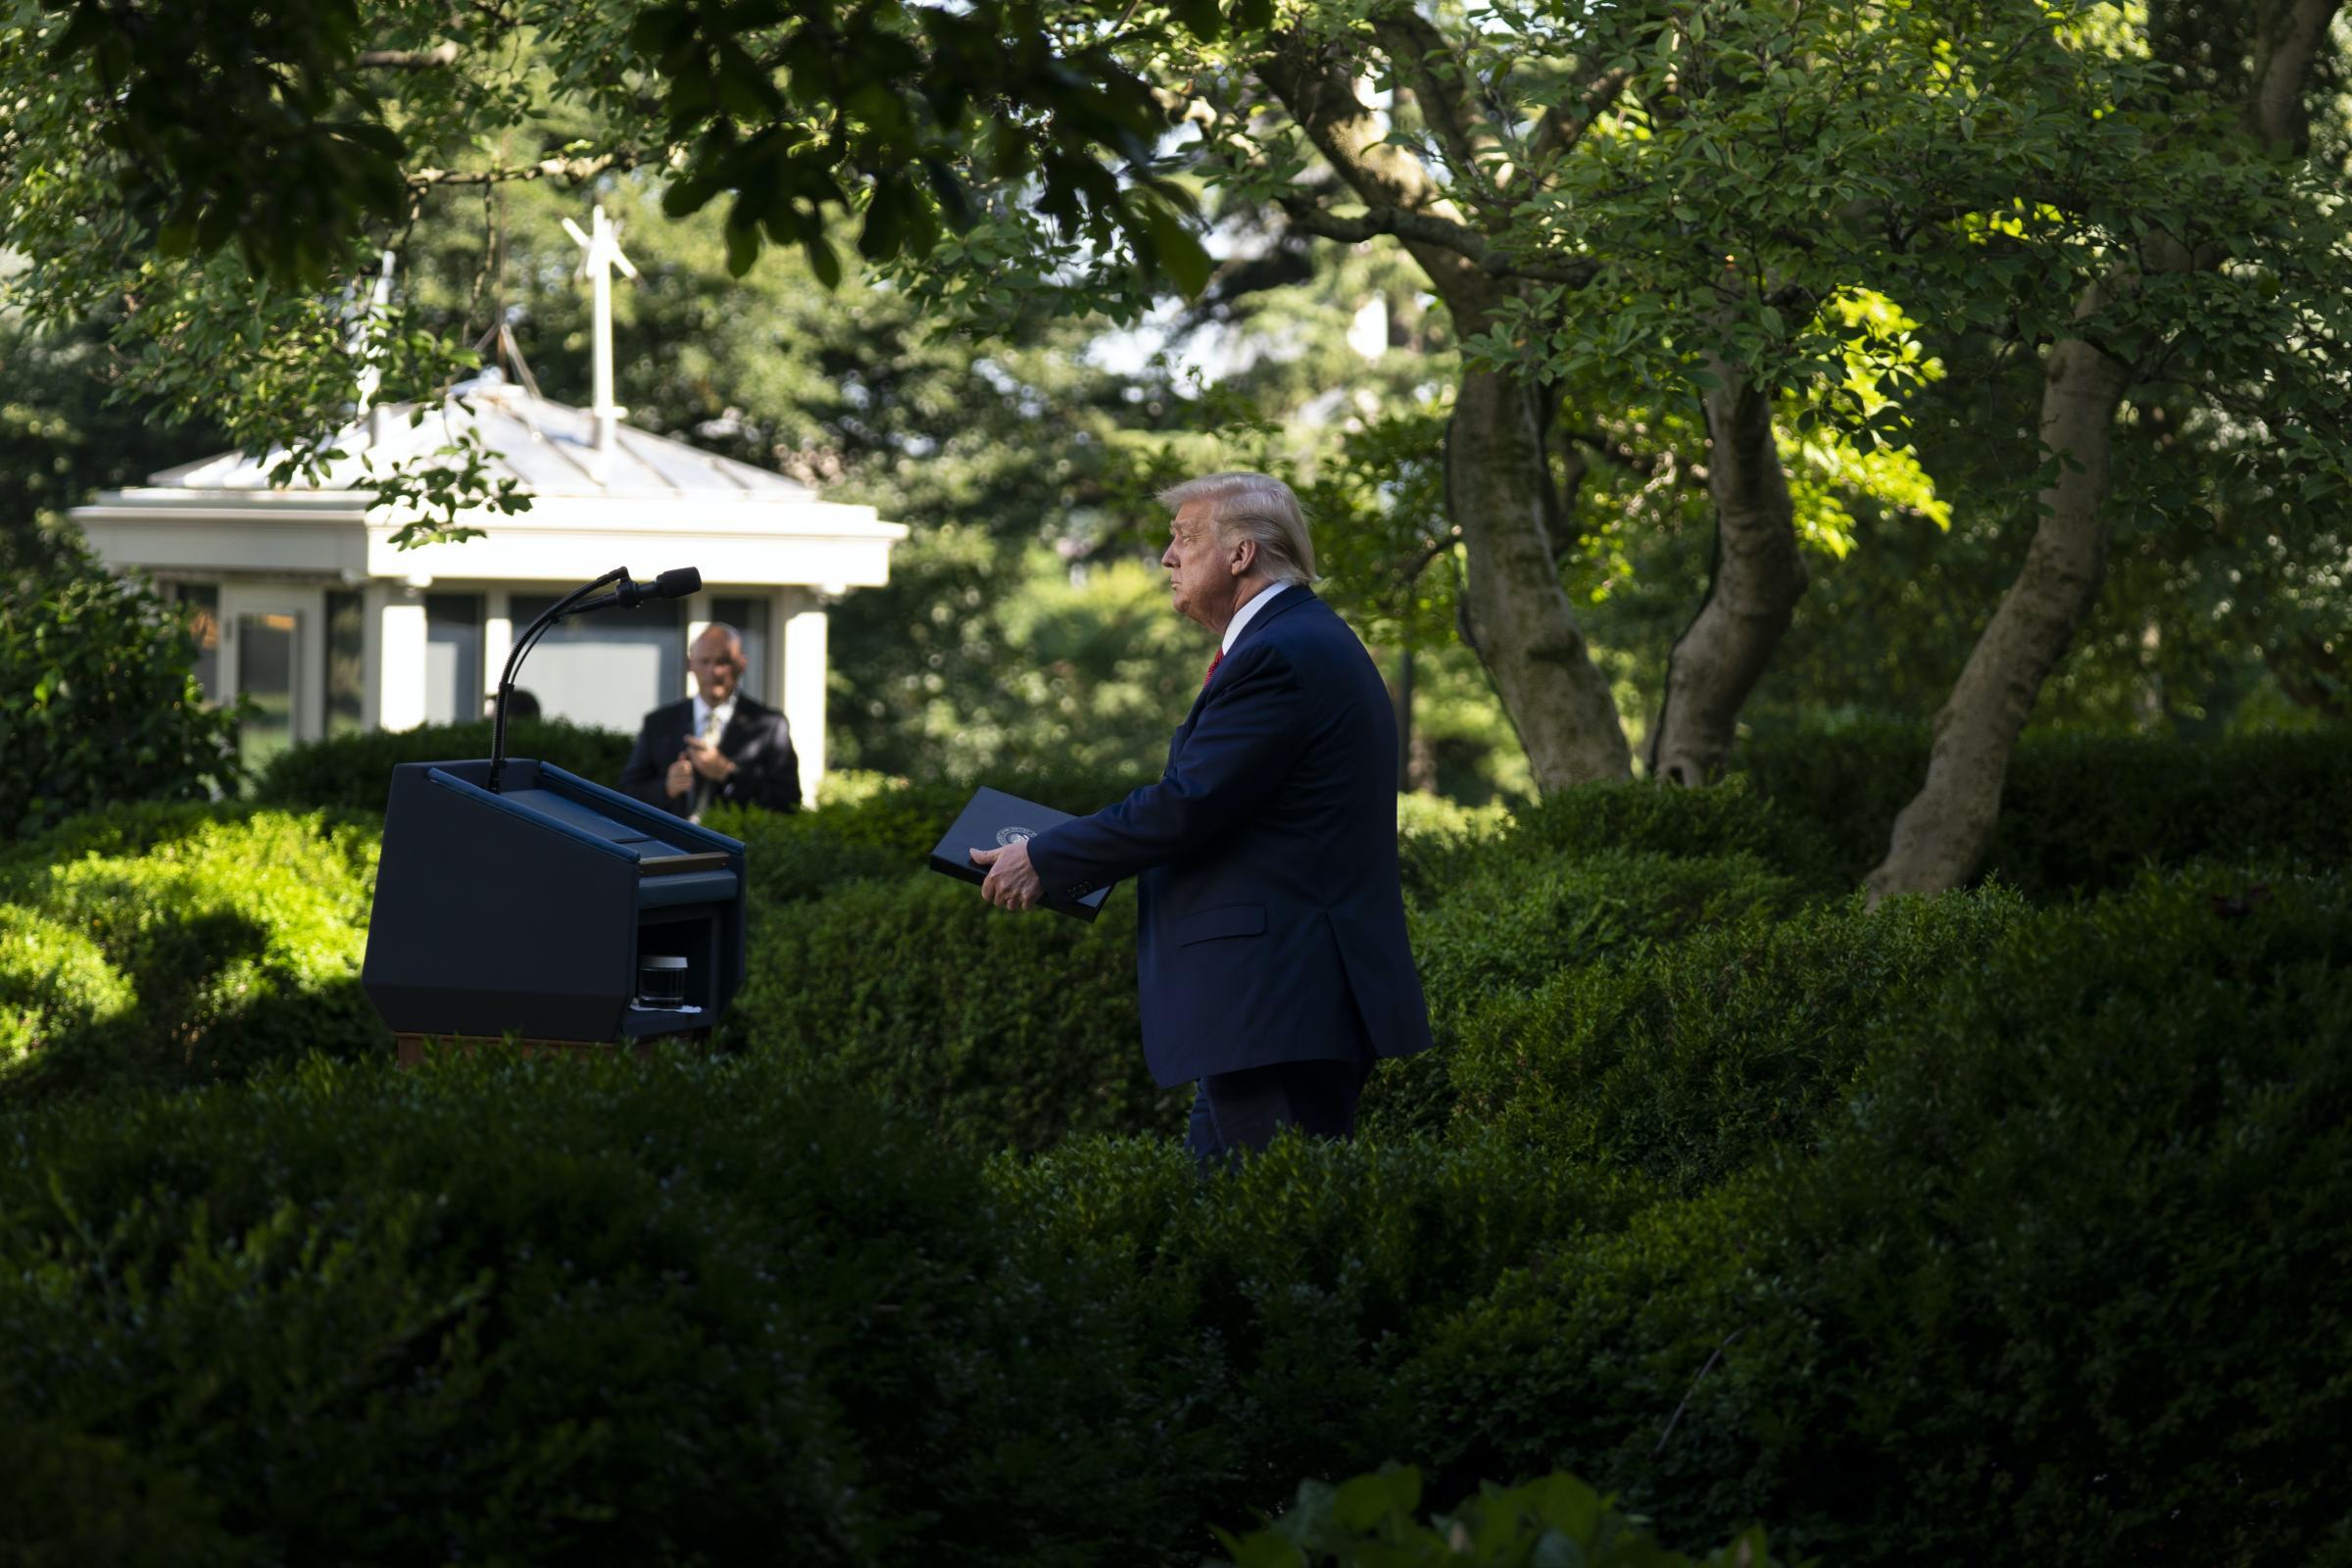 www.asianimage.co.uk: Melania Trump announces makeover for White House Rose Garden